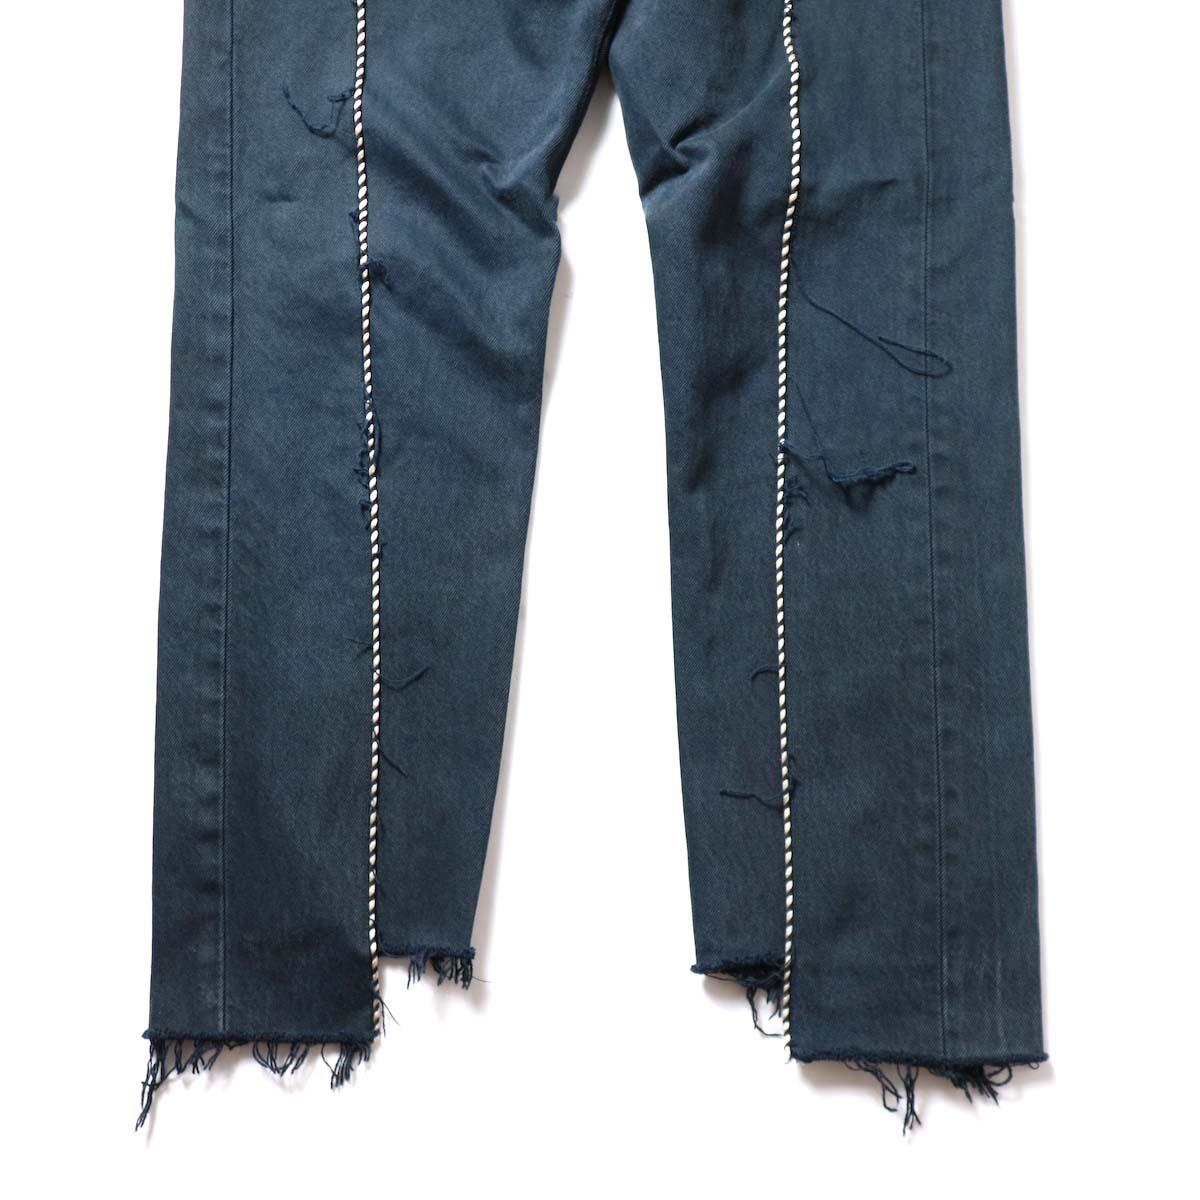 OLD PARK / Western Jeans Black (Msize-H)裾